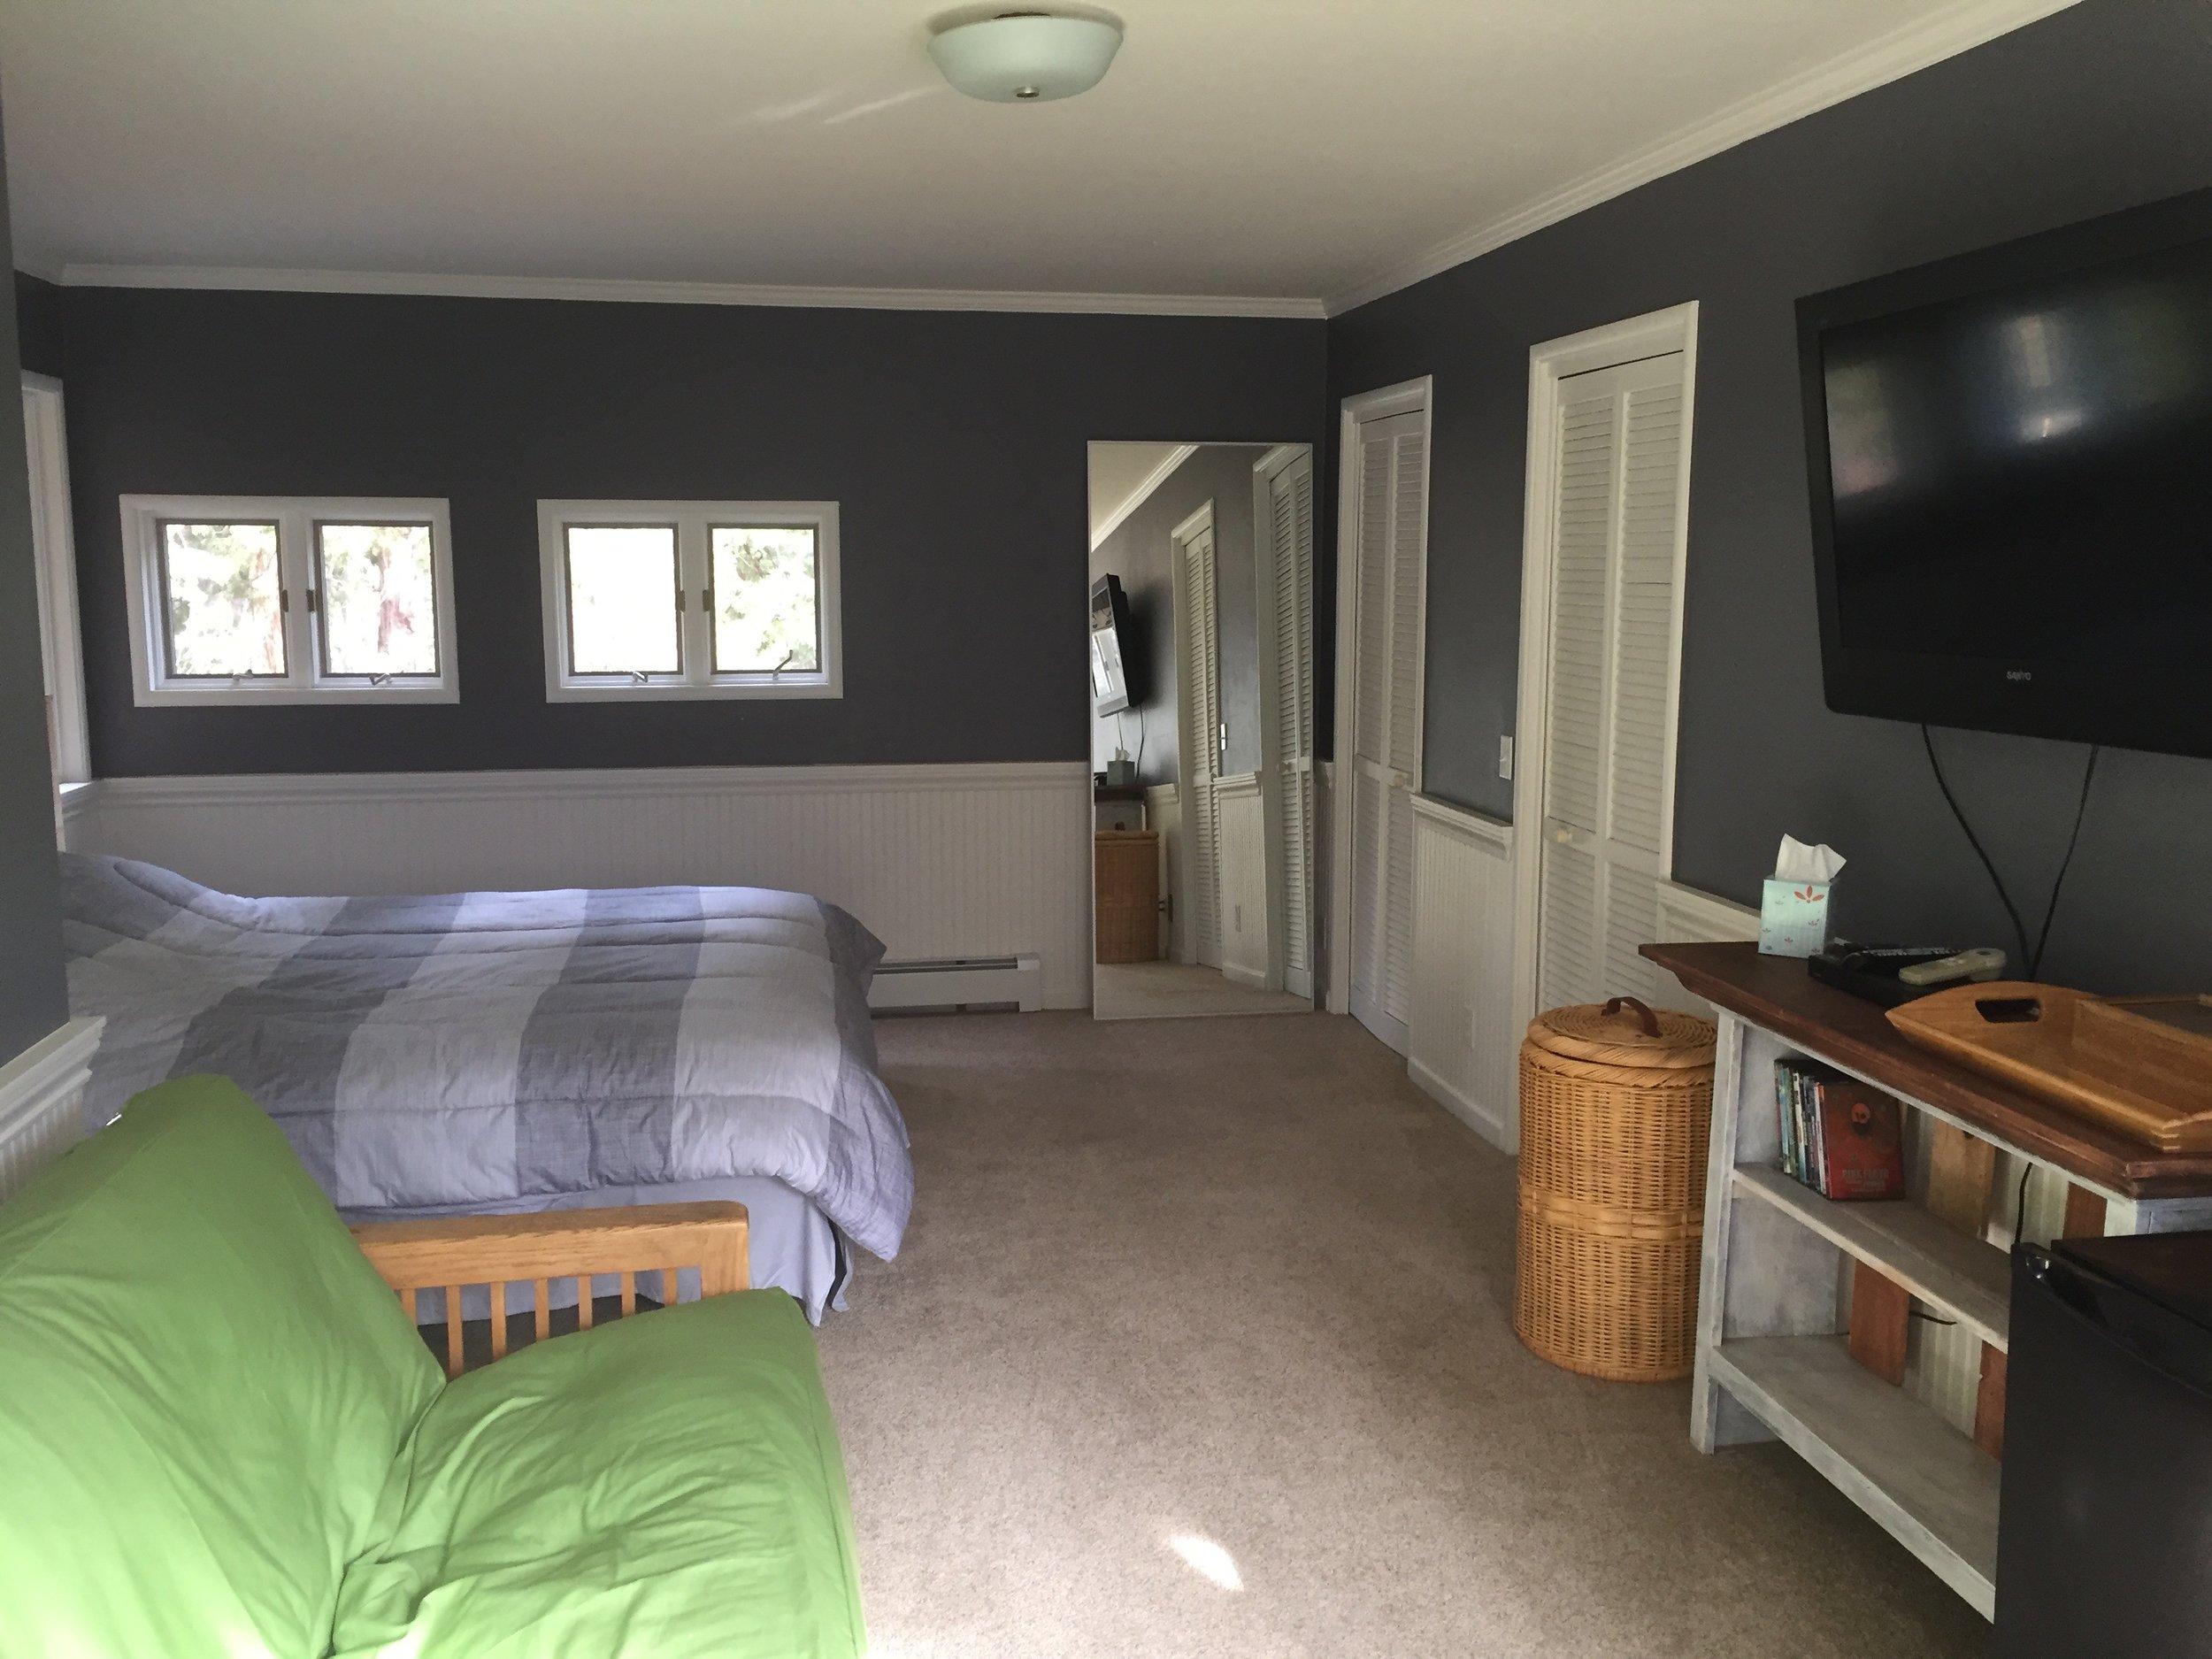 Private Apt Room Rental